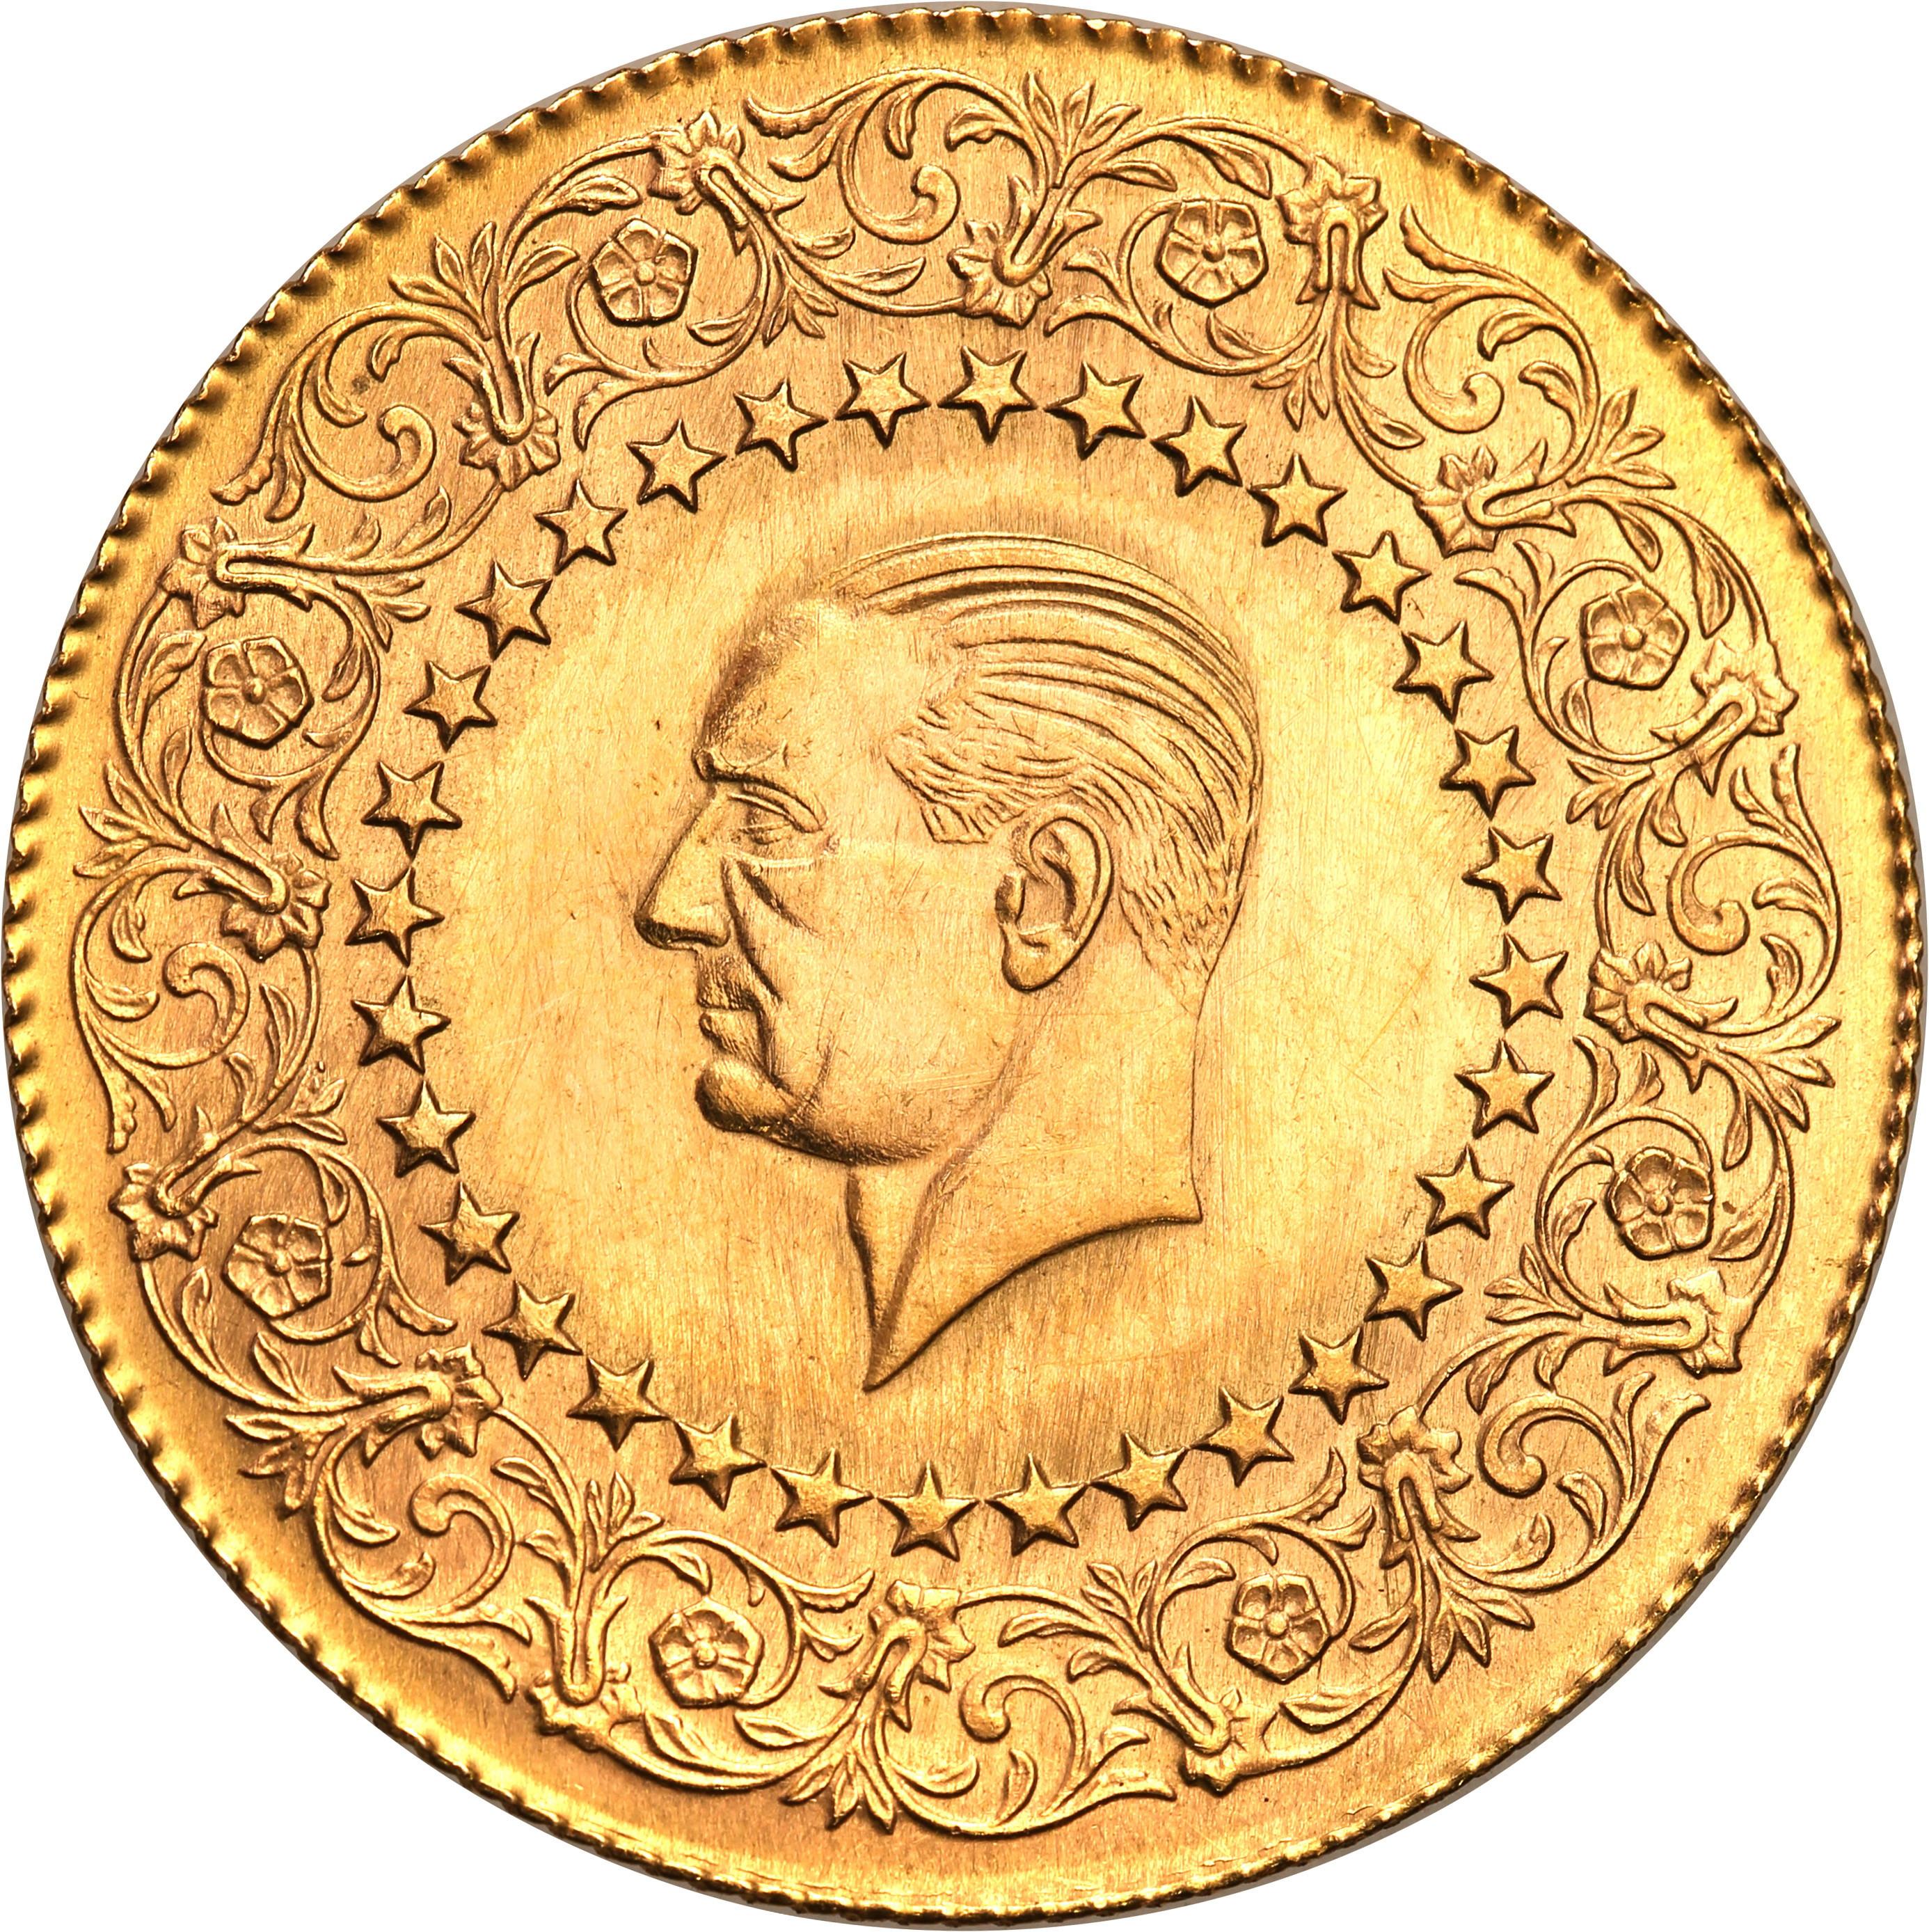 Turcja. 100 kurus de Luxe 1963 Prezydent Kemal Atatürk st.1-